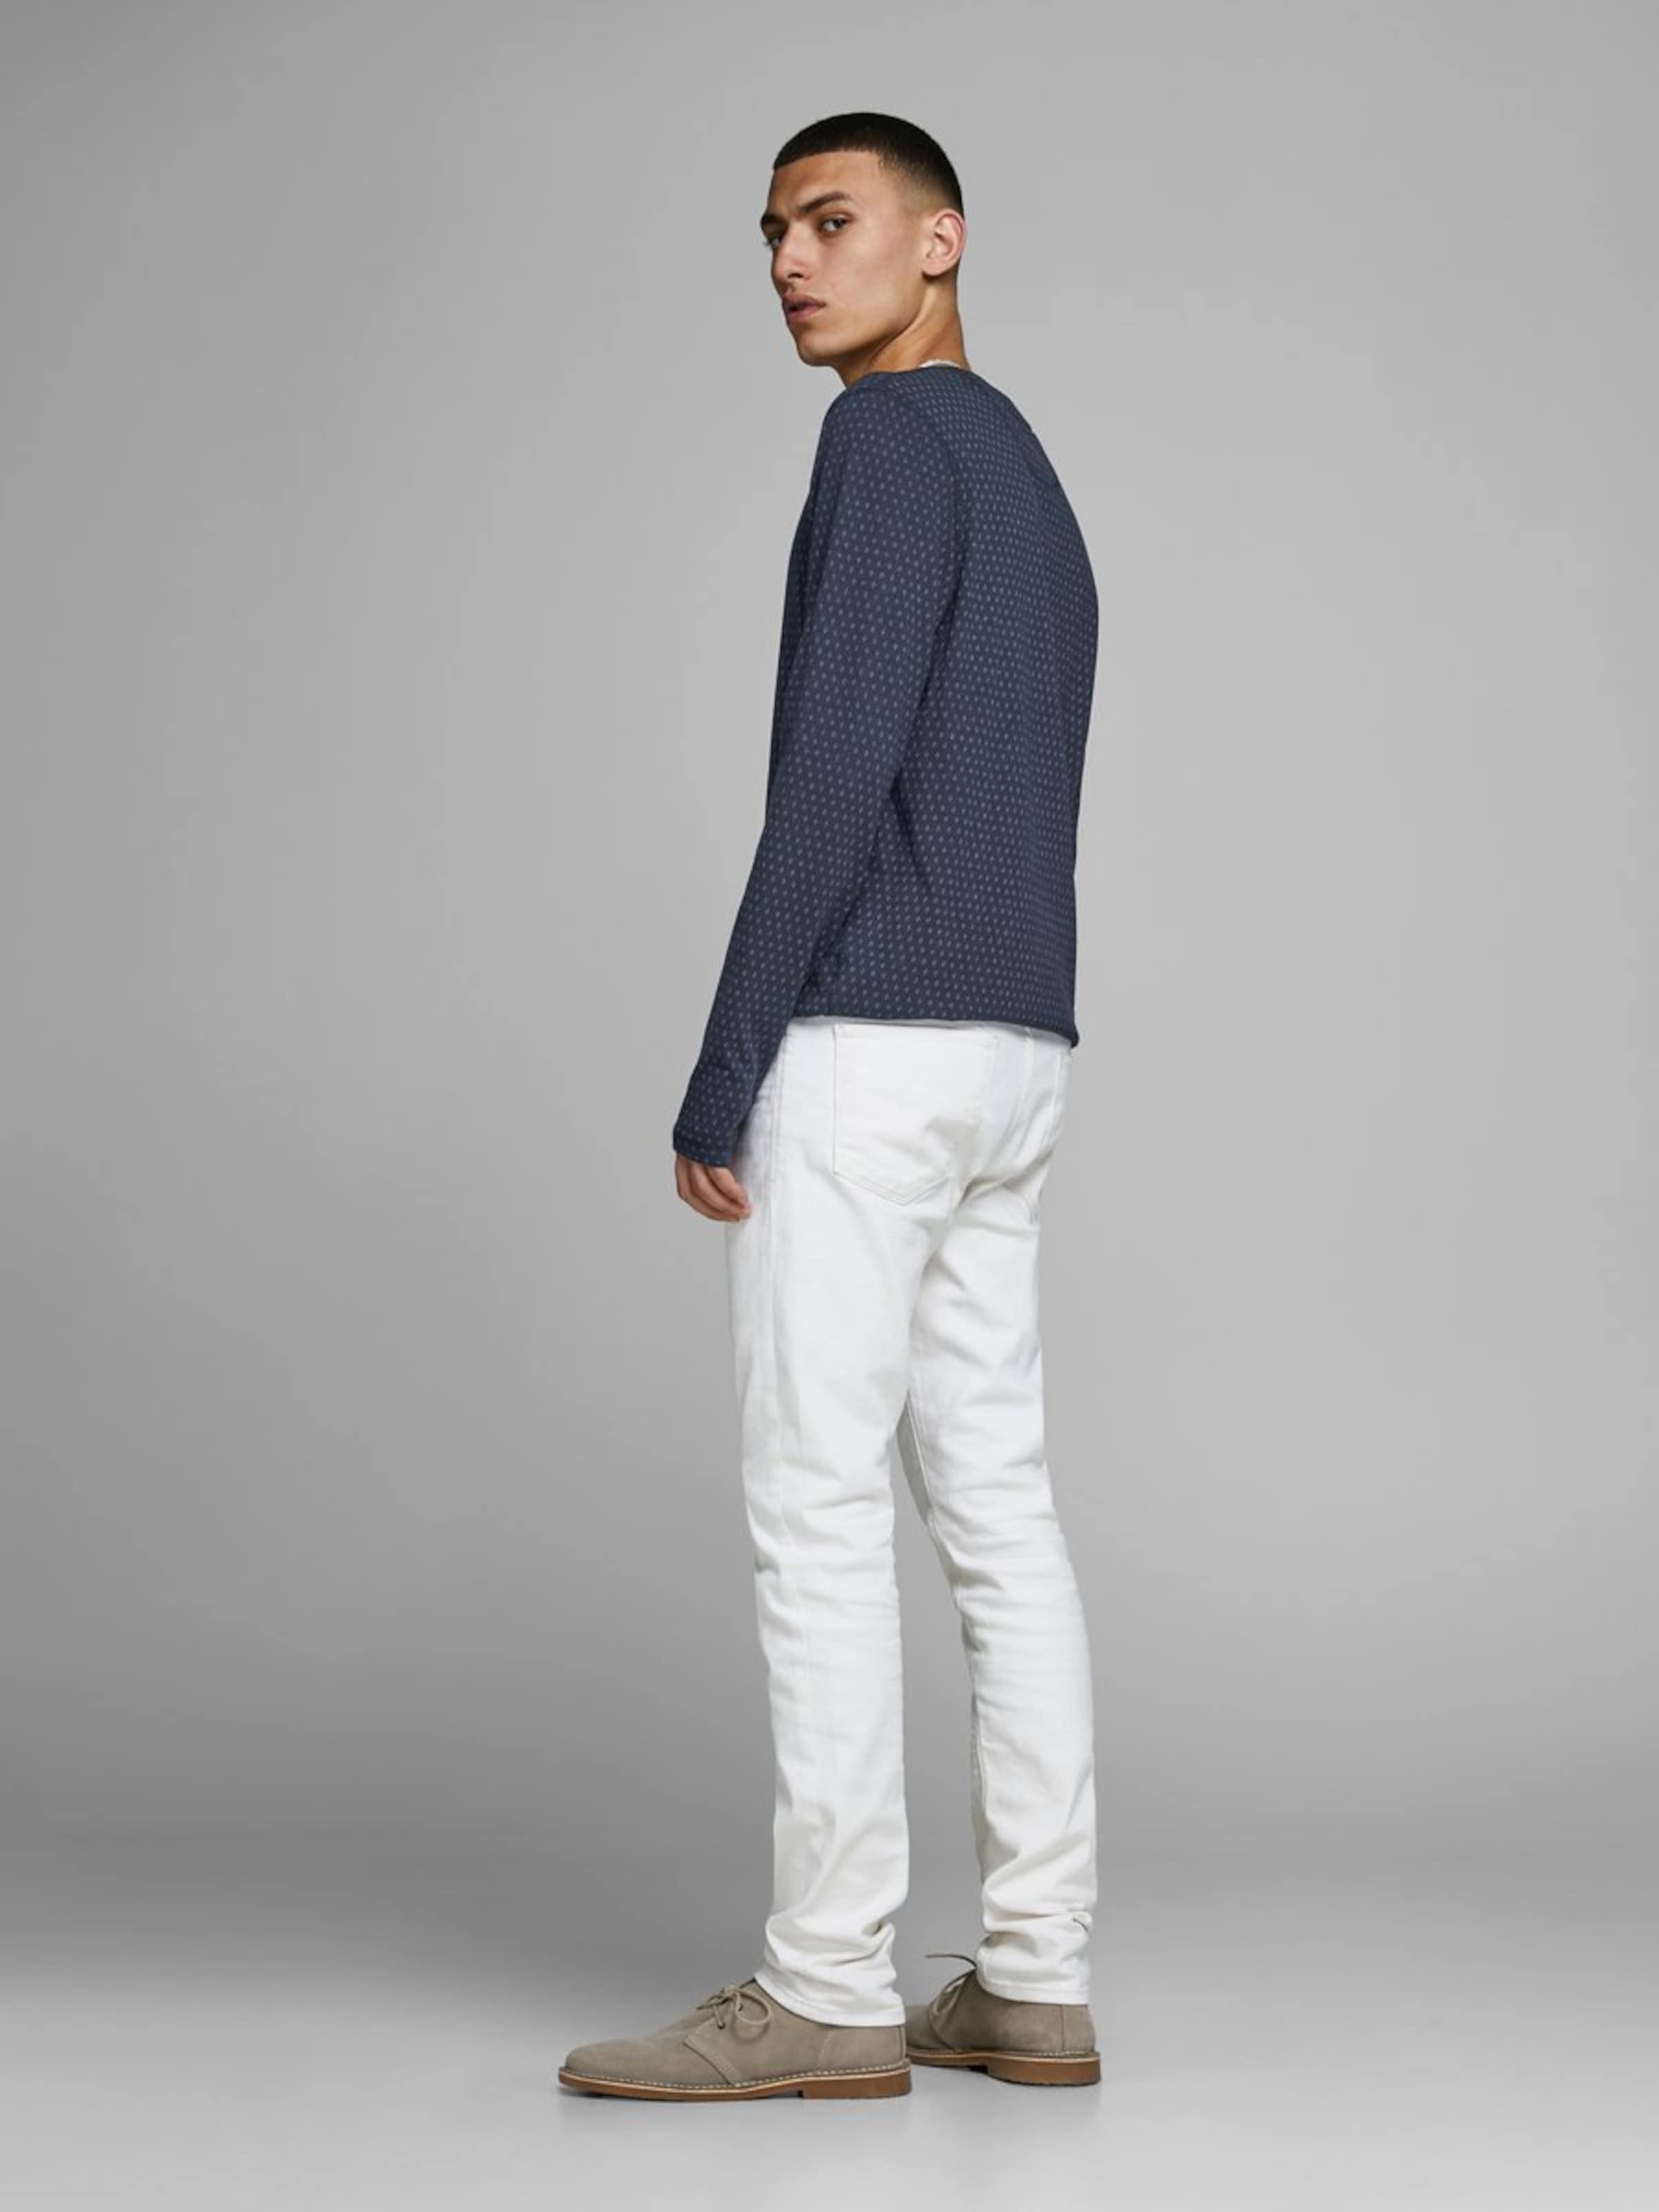 Jackamp; Blanc En T Perle shirt Jones rCQWxeodB